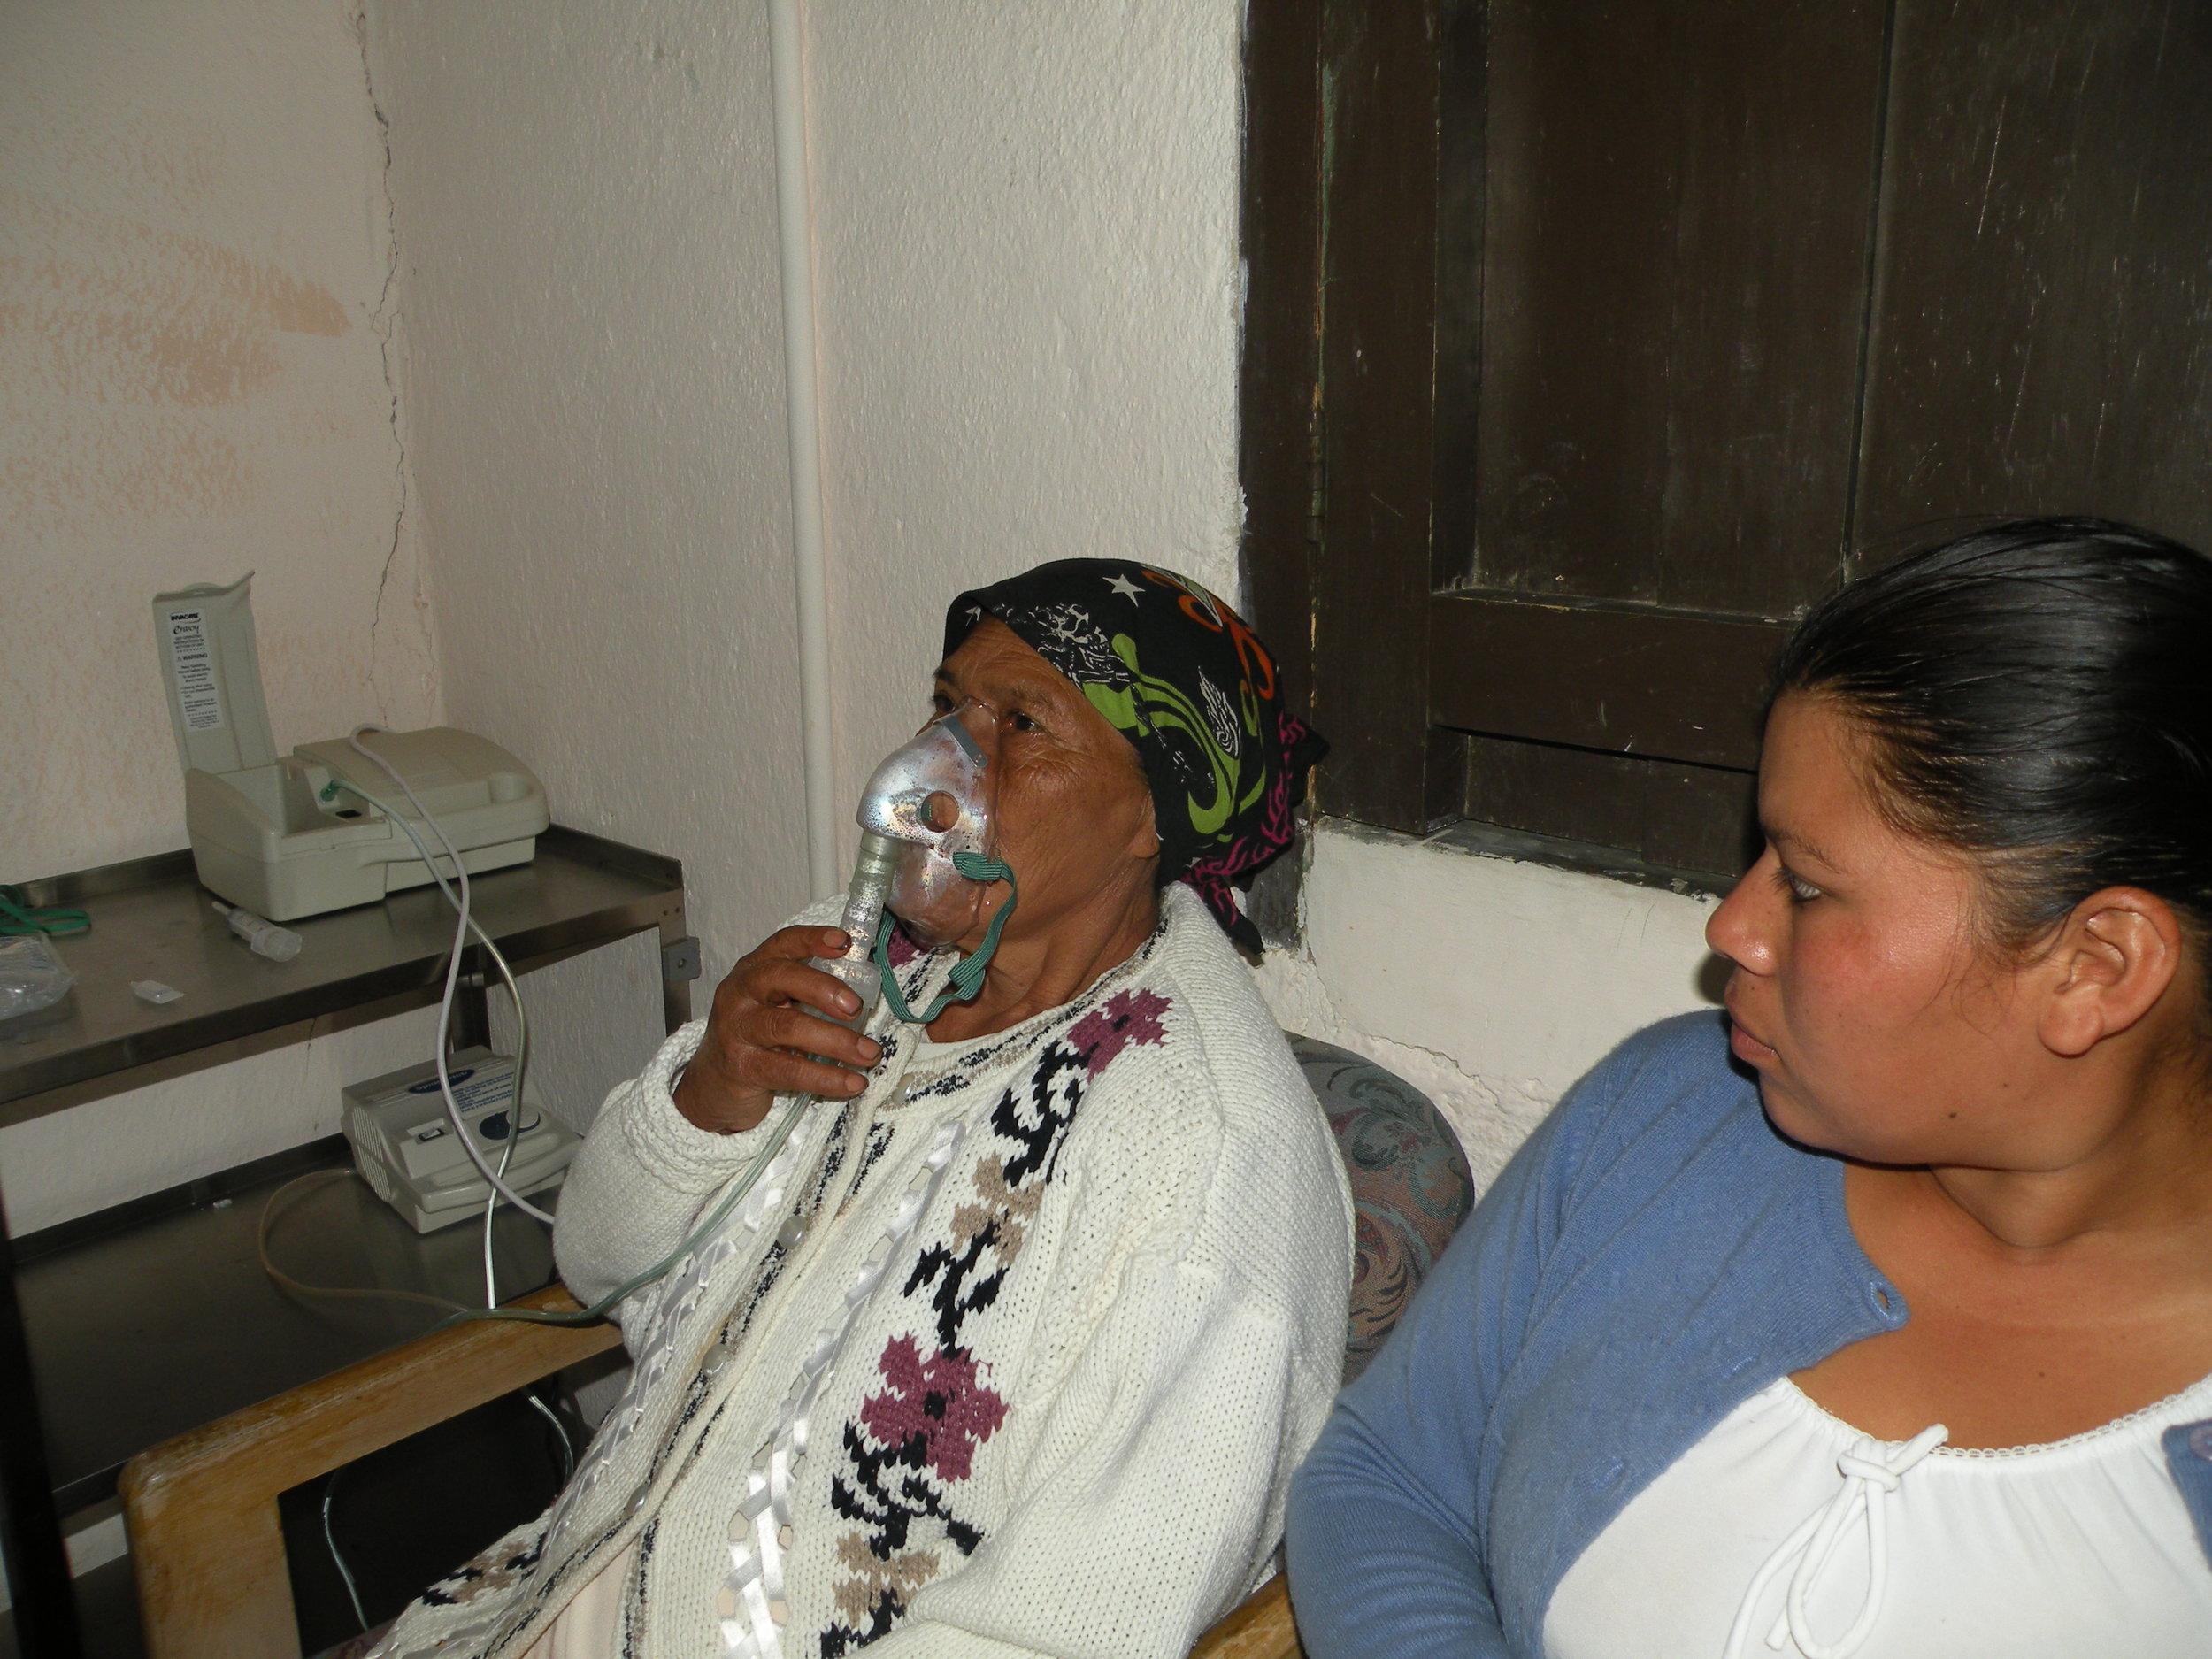 respiaratory-treatment_16867256482_o.jpg